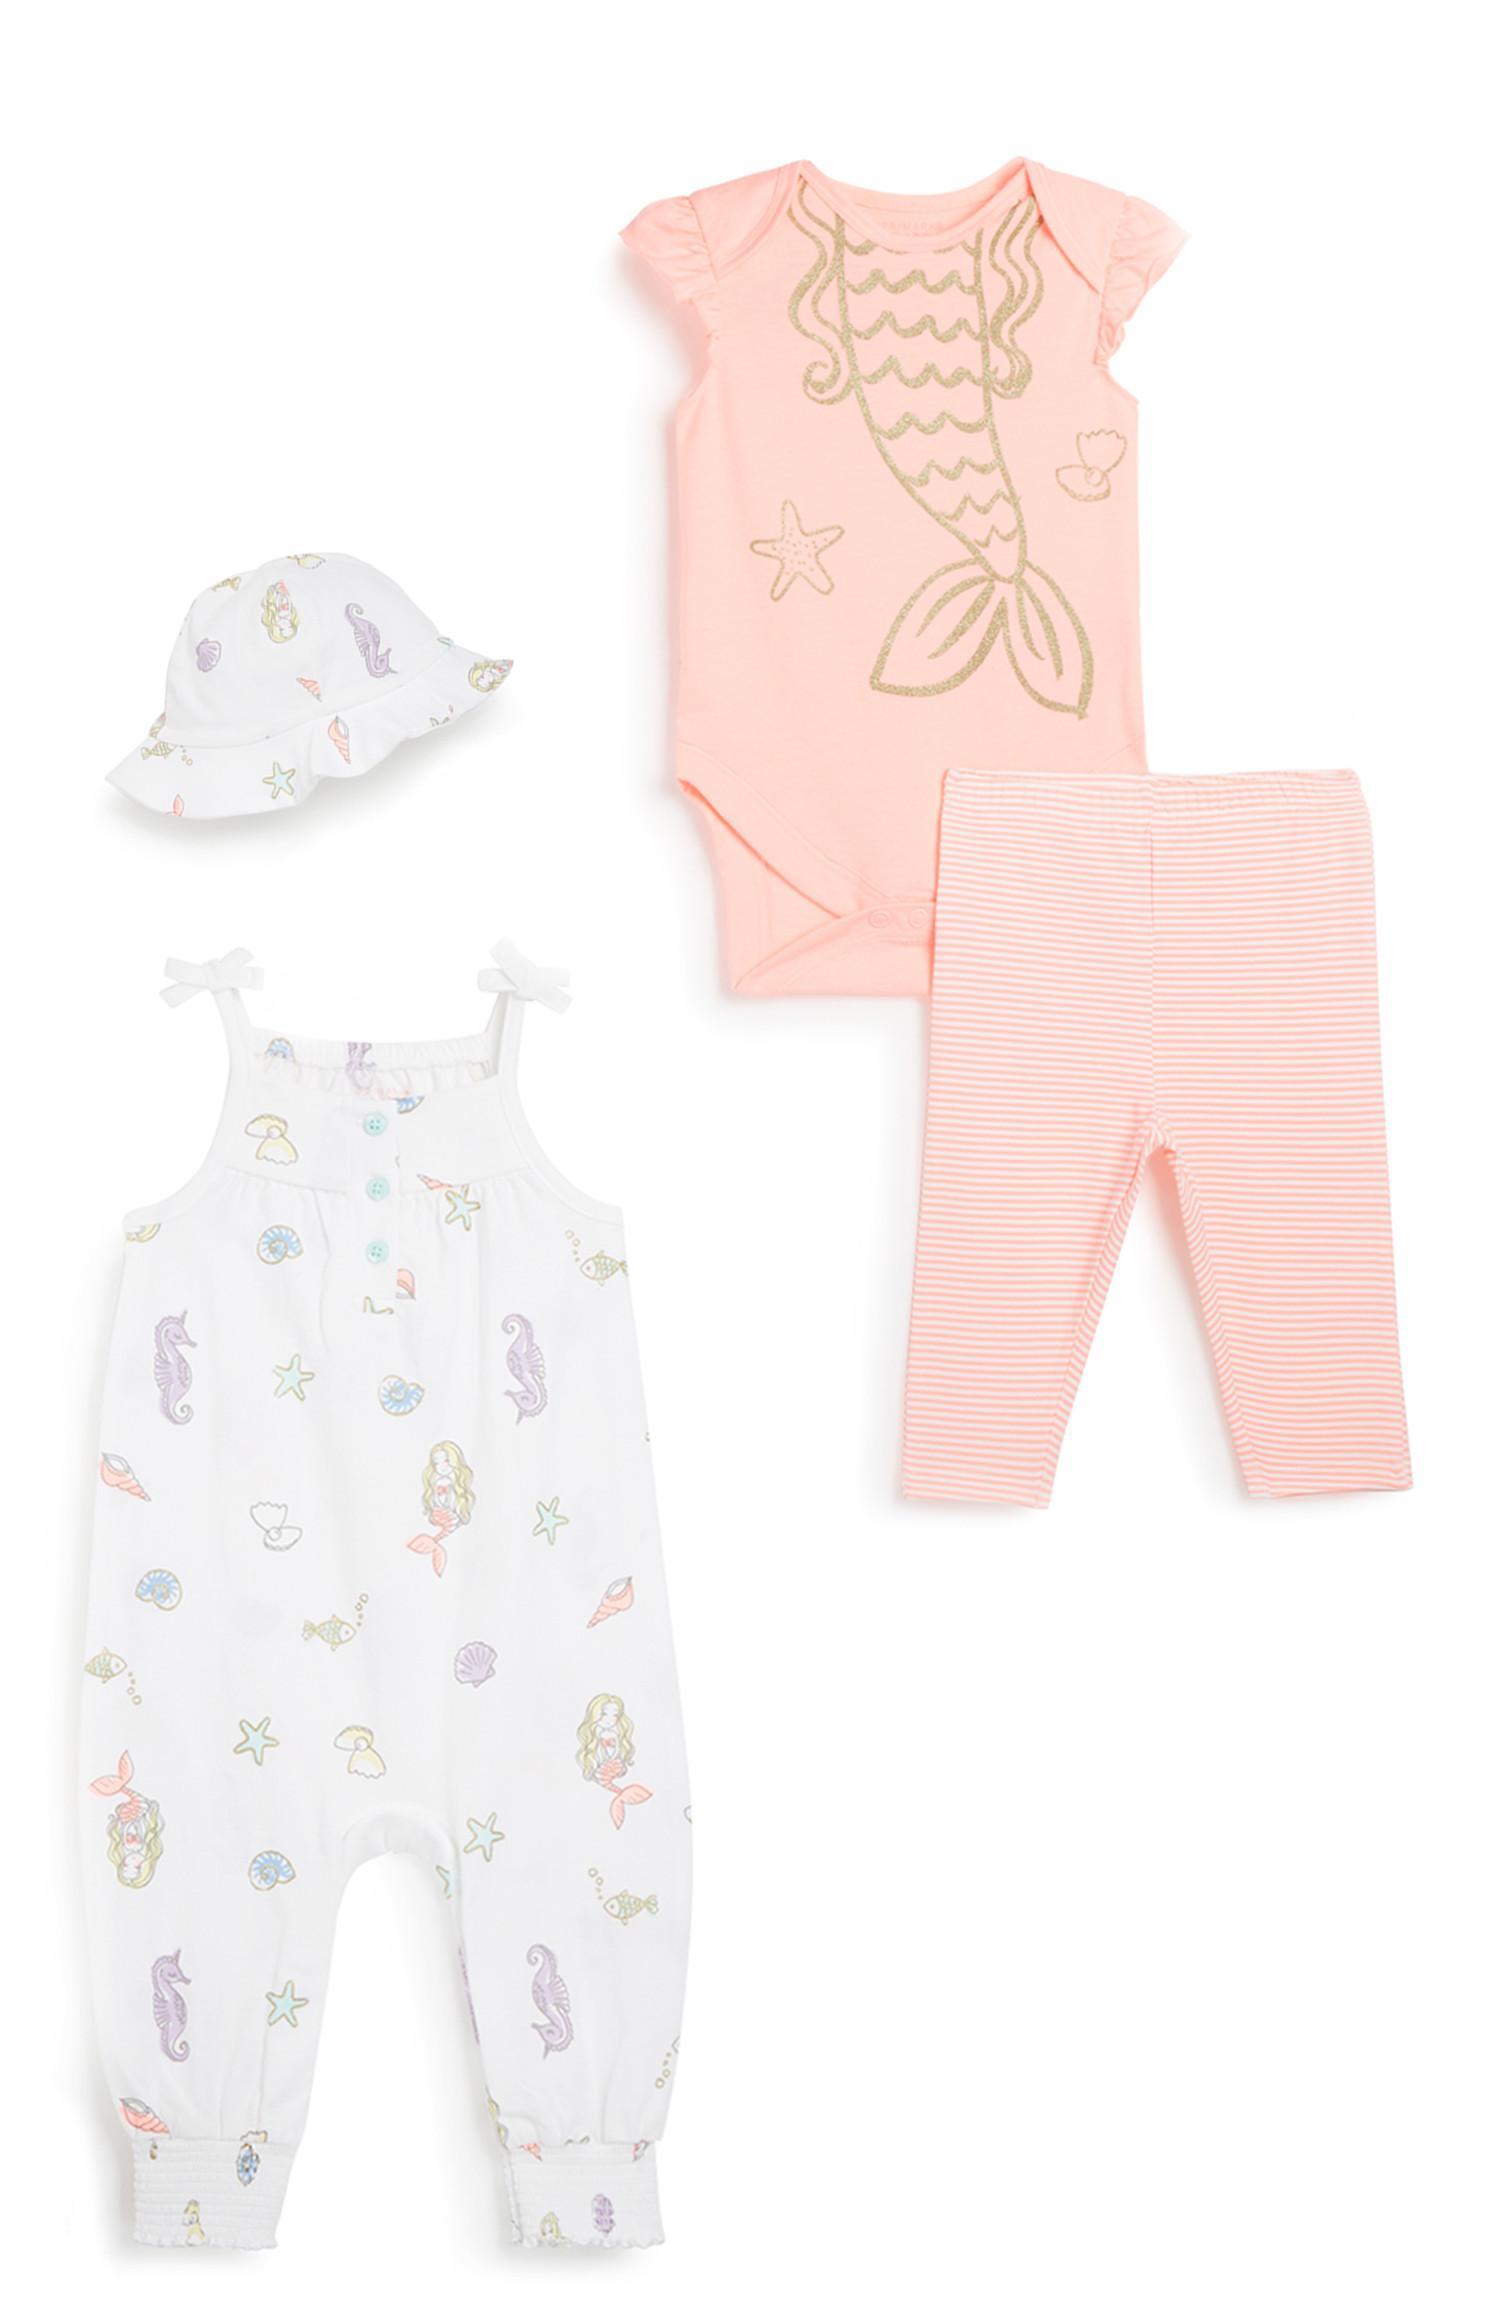 4-teiliges Outfit-Set für Babys (M)